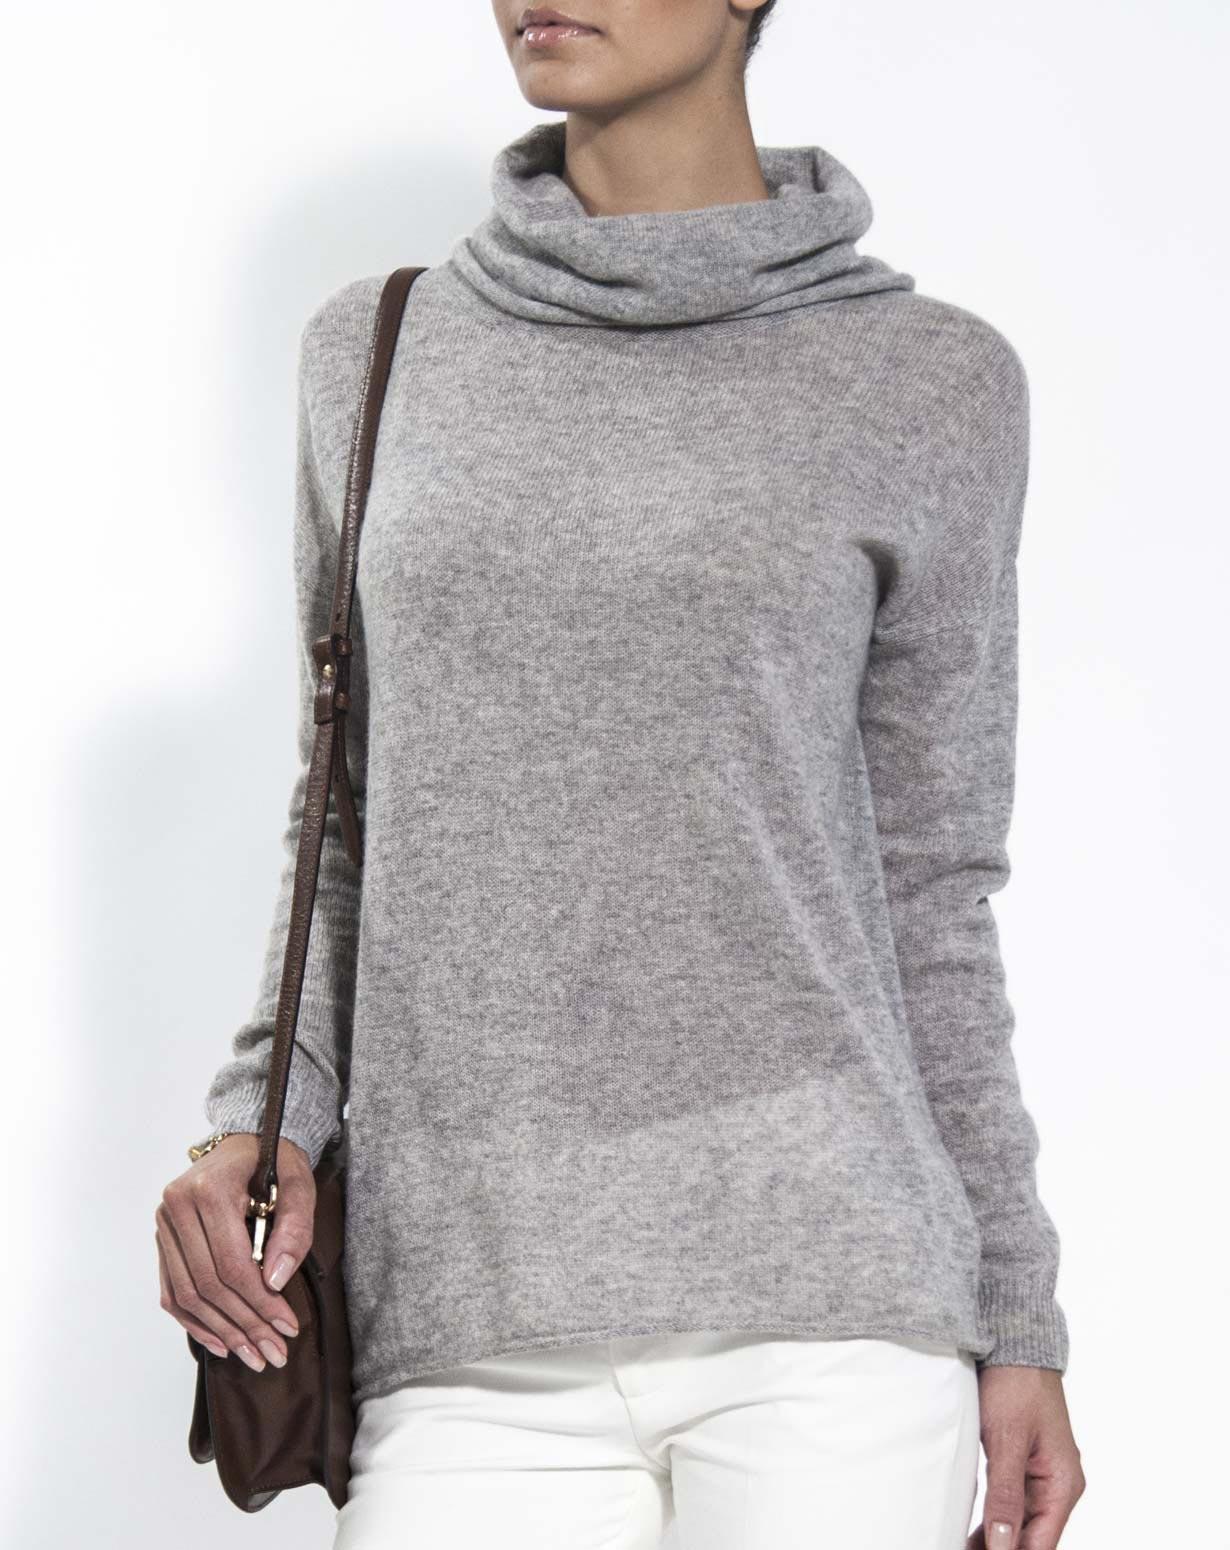 cashmere jumpers ladiesu0027 oversized cashmere cowl neck jumper lzhhxzp